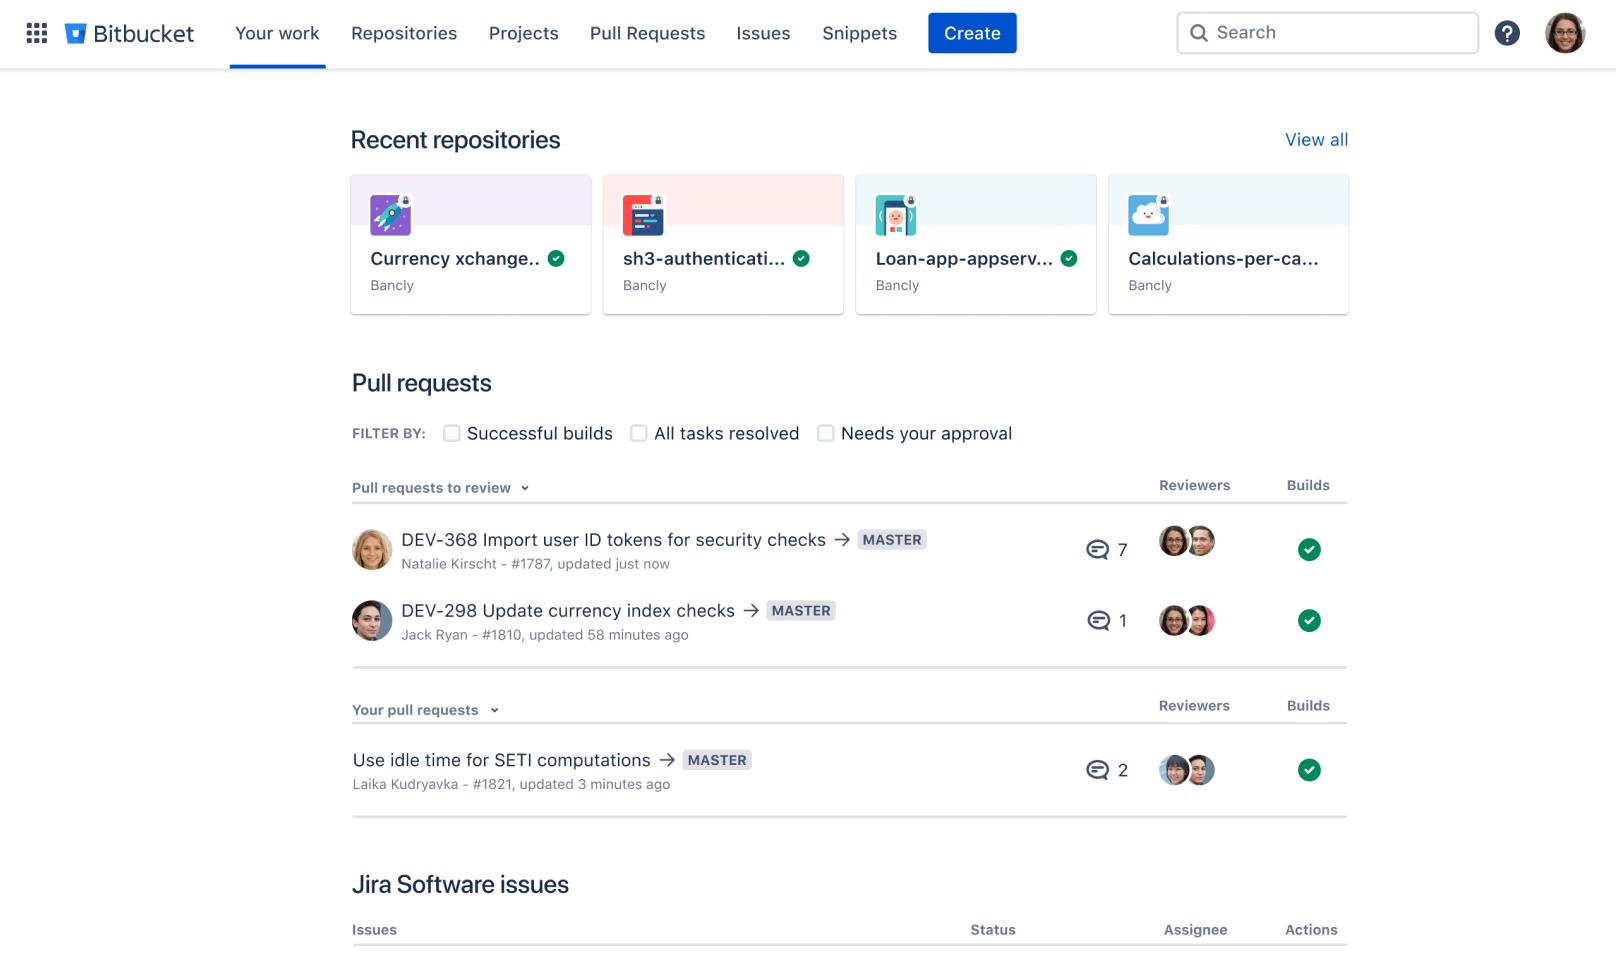 Bitbucket dashboard